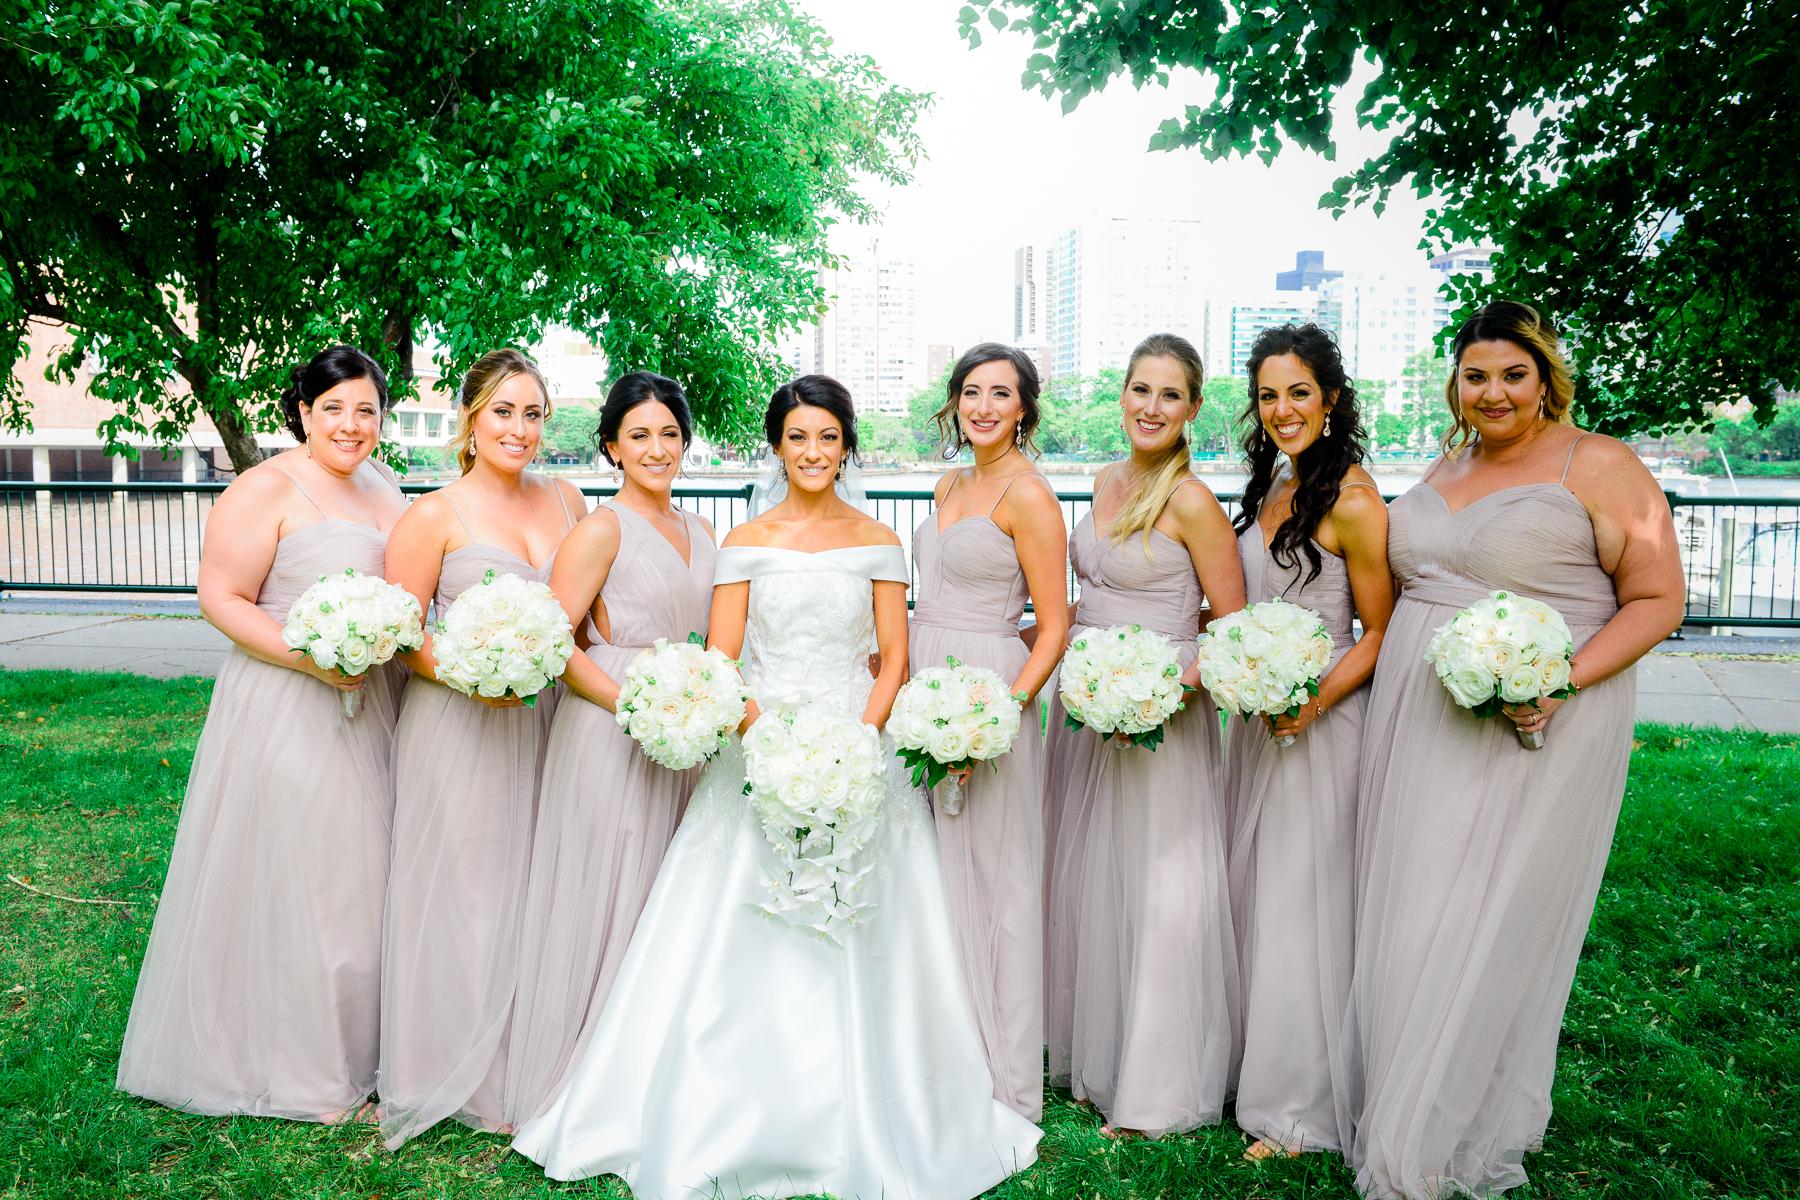 Boston Wedding Photographer Christian Pleva-67.jpg